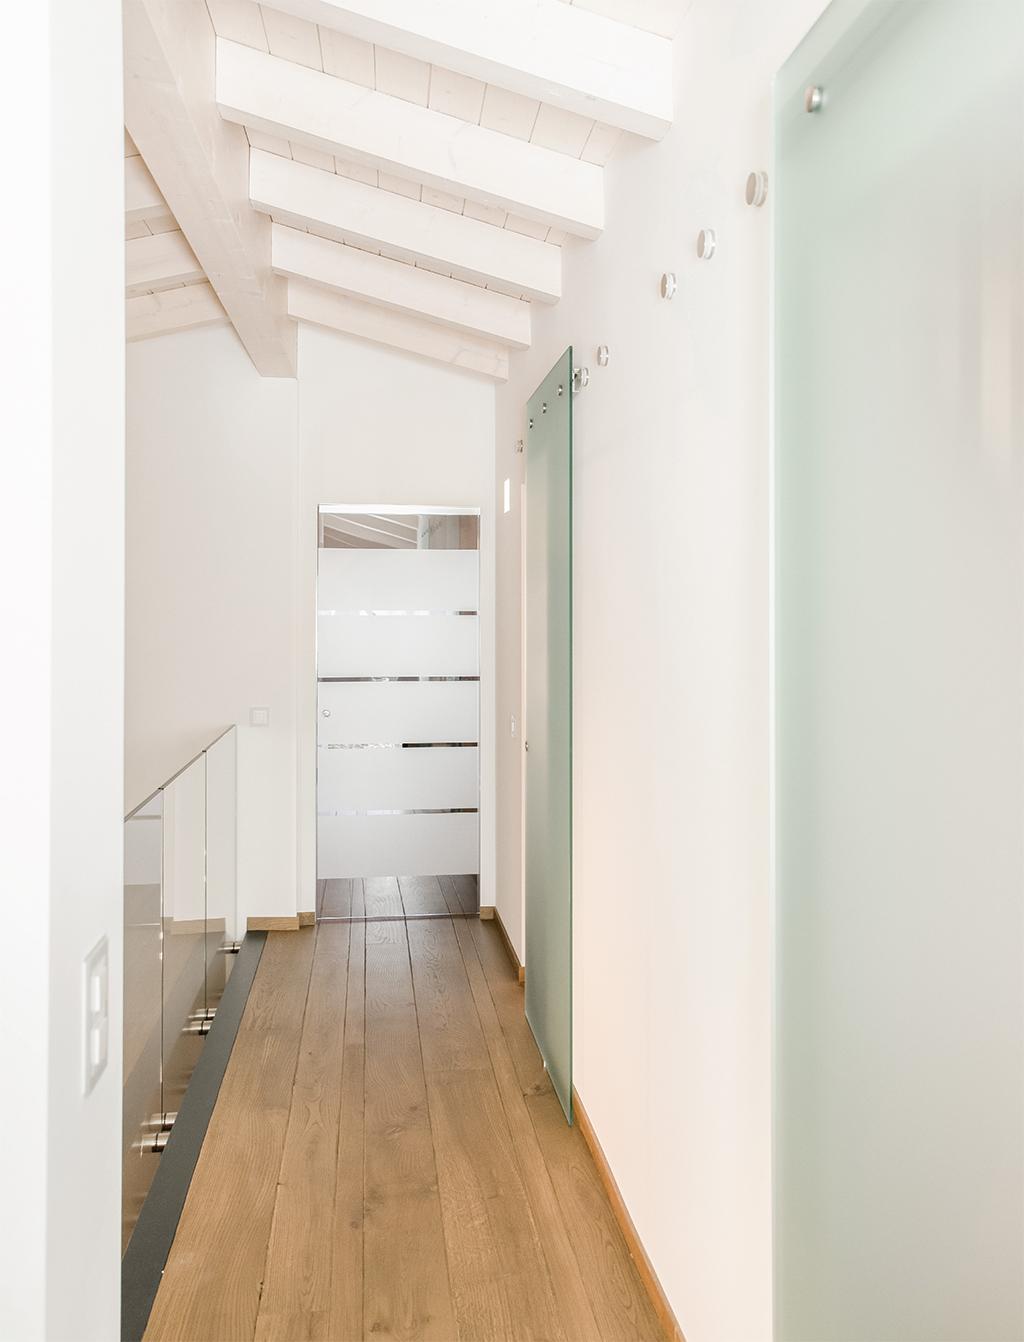 Private residence in switzerland galbiati arreda for Galbiati arreda